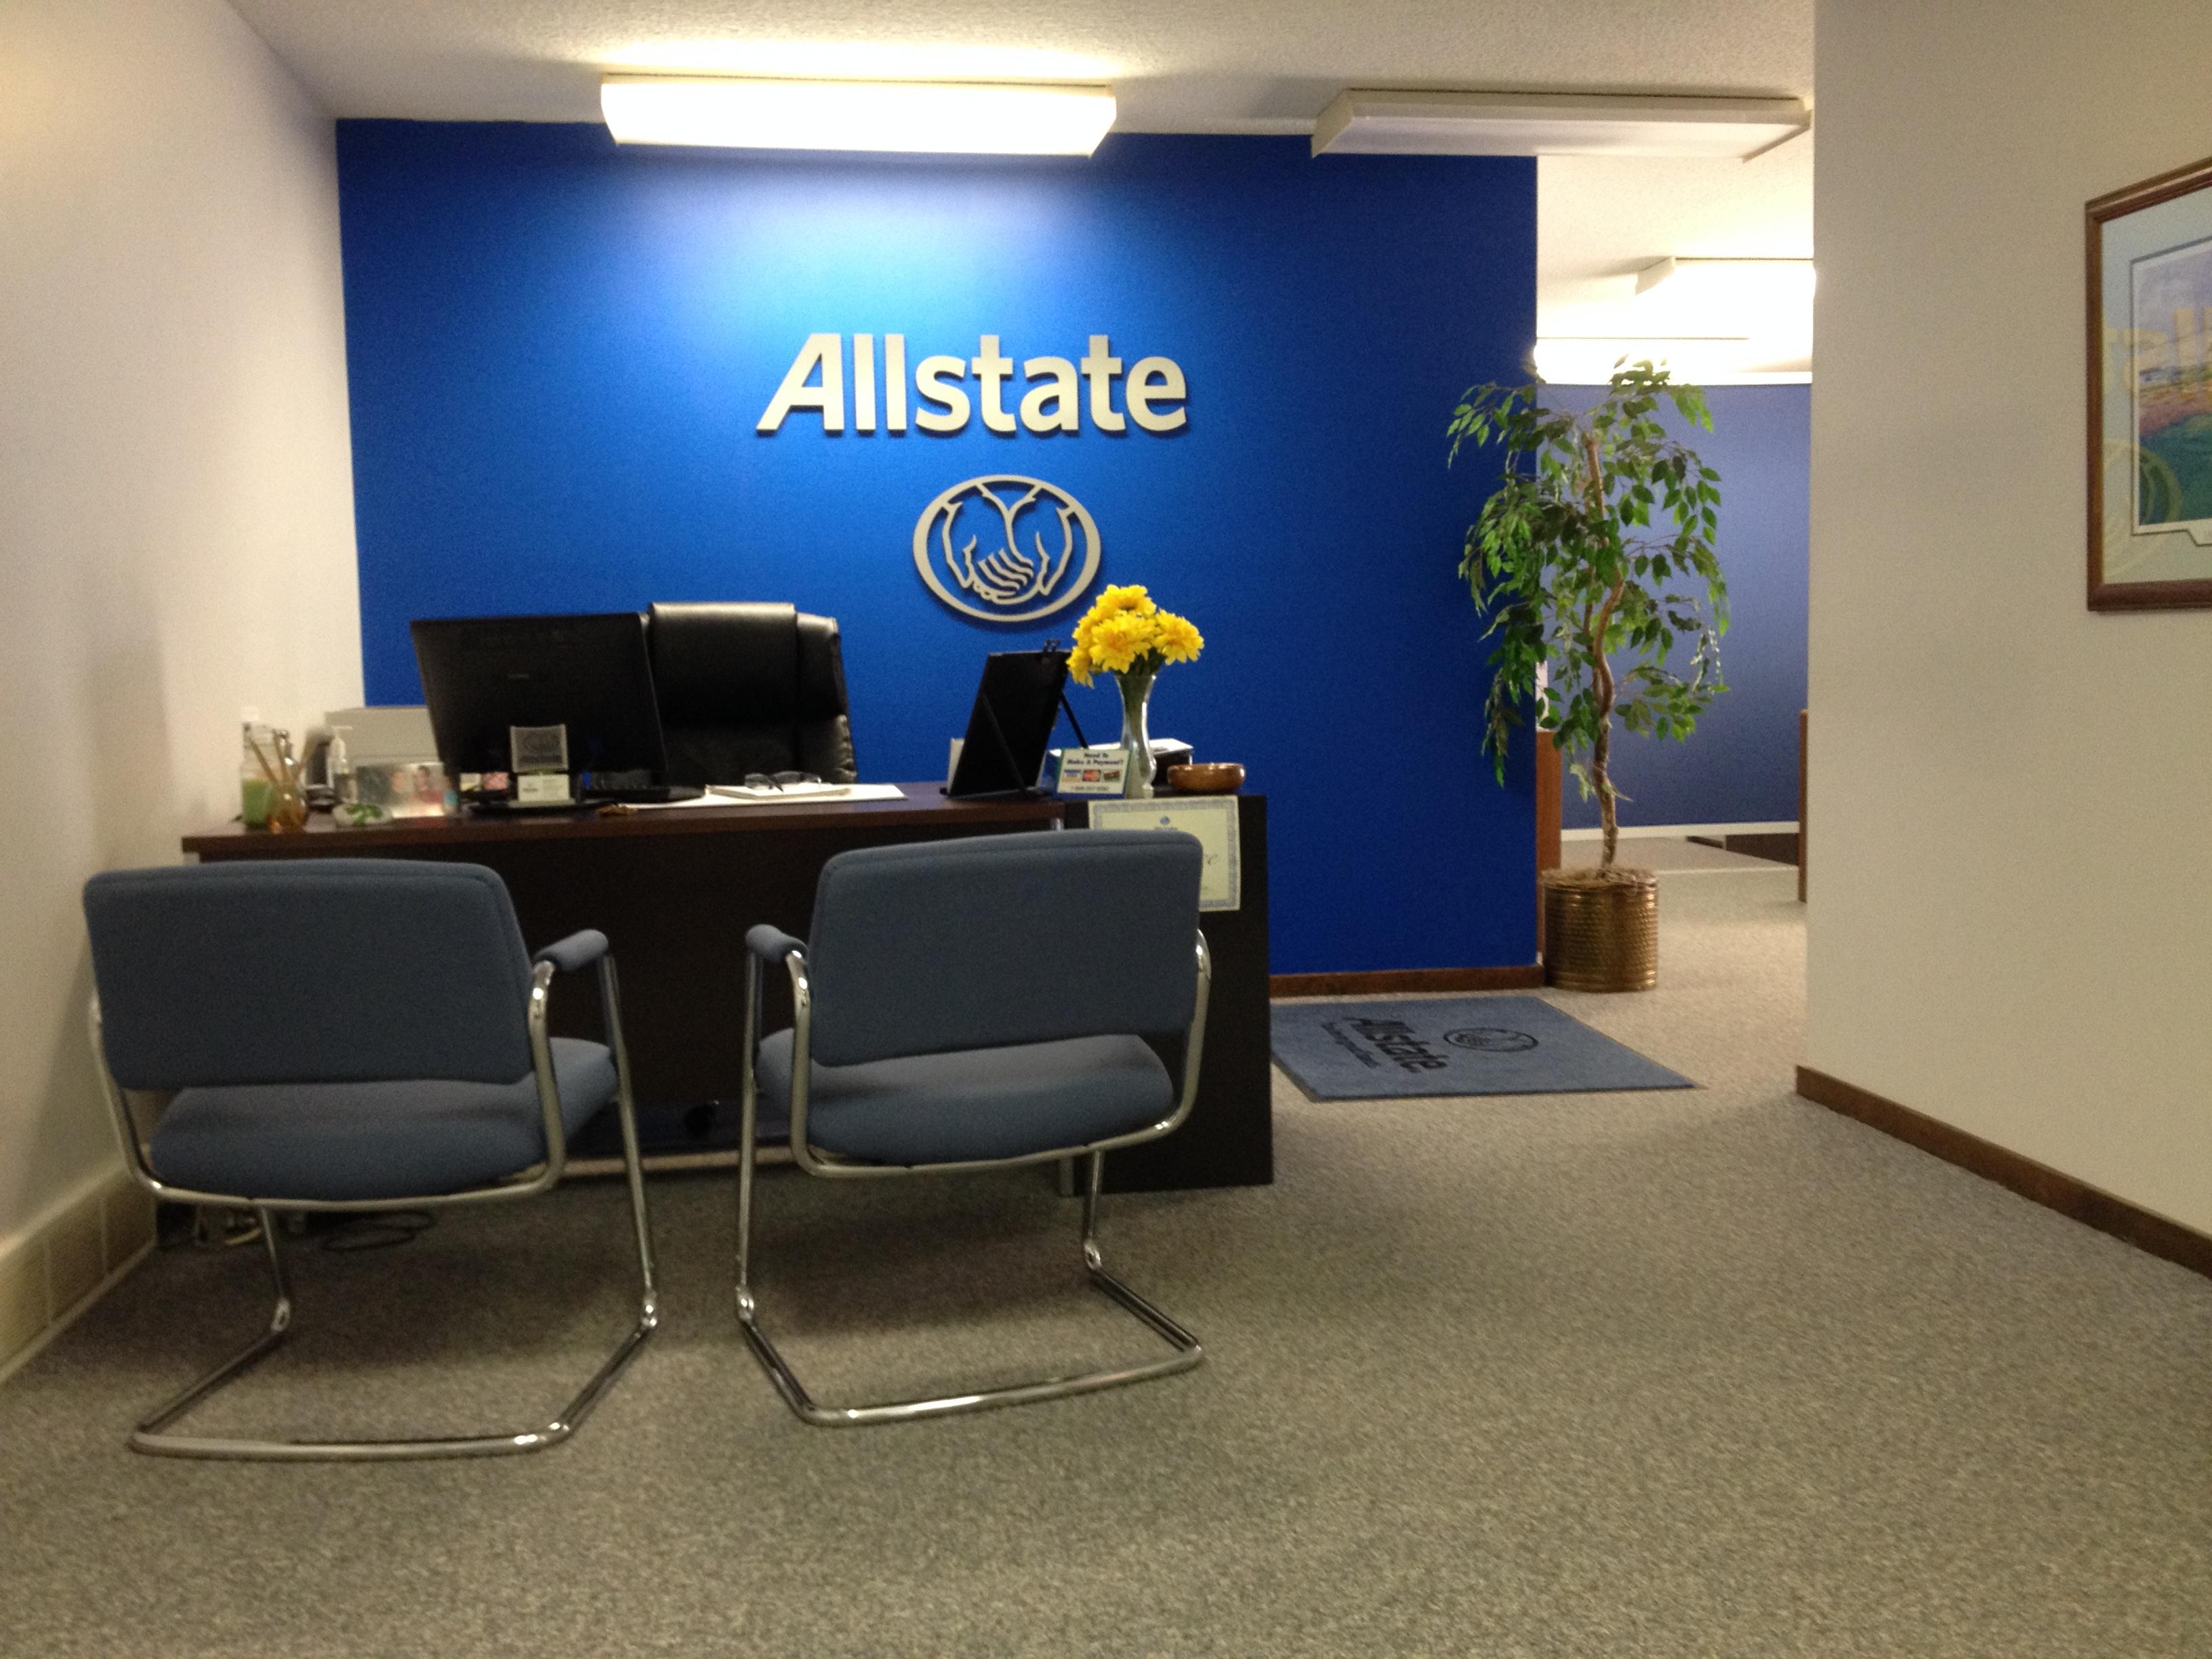 Allstate Insurance Agent: Debra OBrien image 2